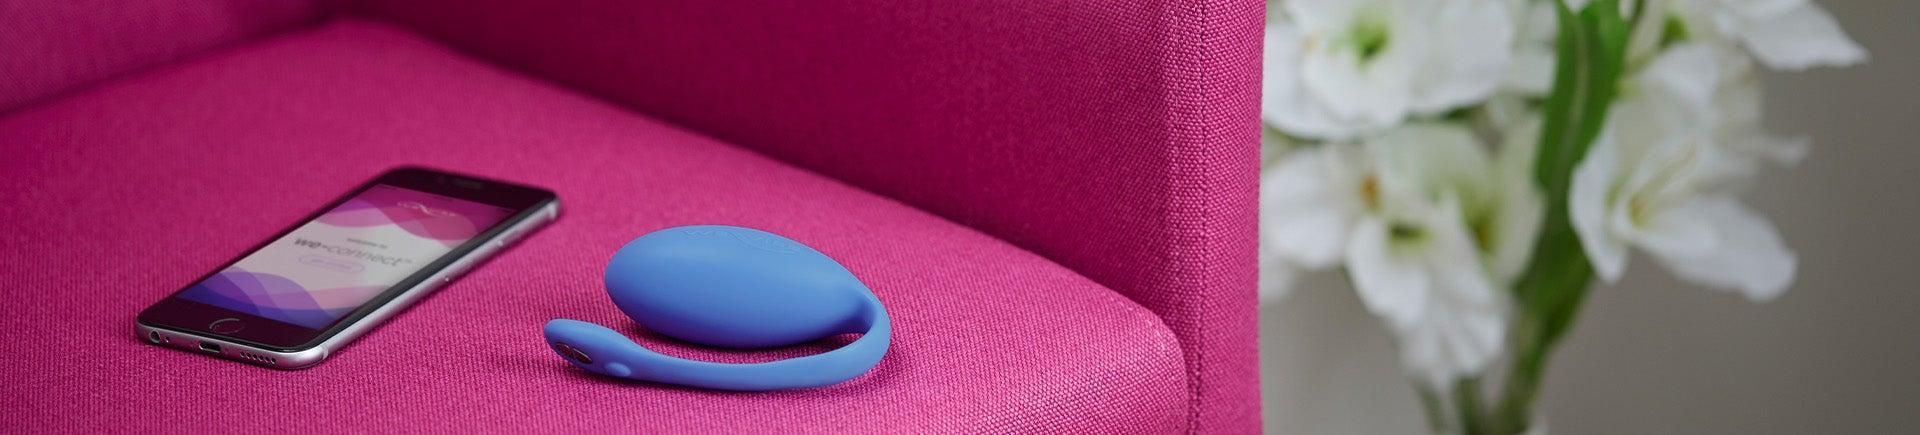 we-vibe-jive-bluetooth-vibrator